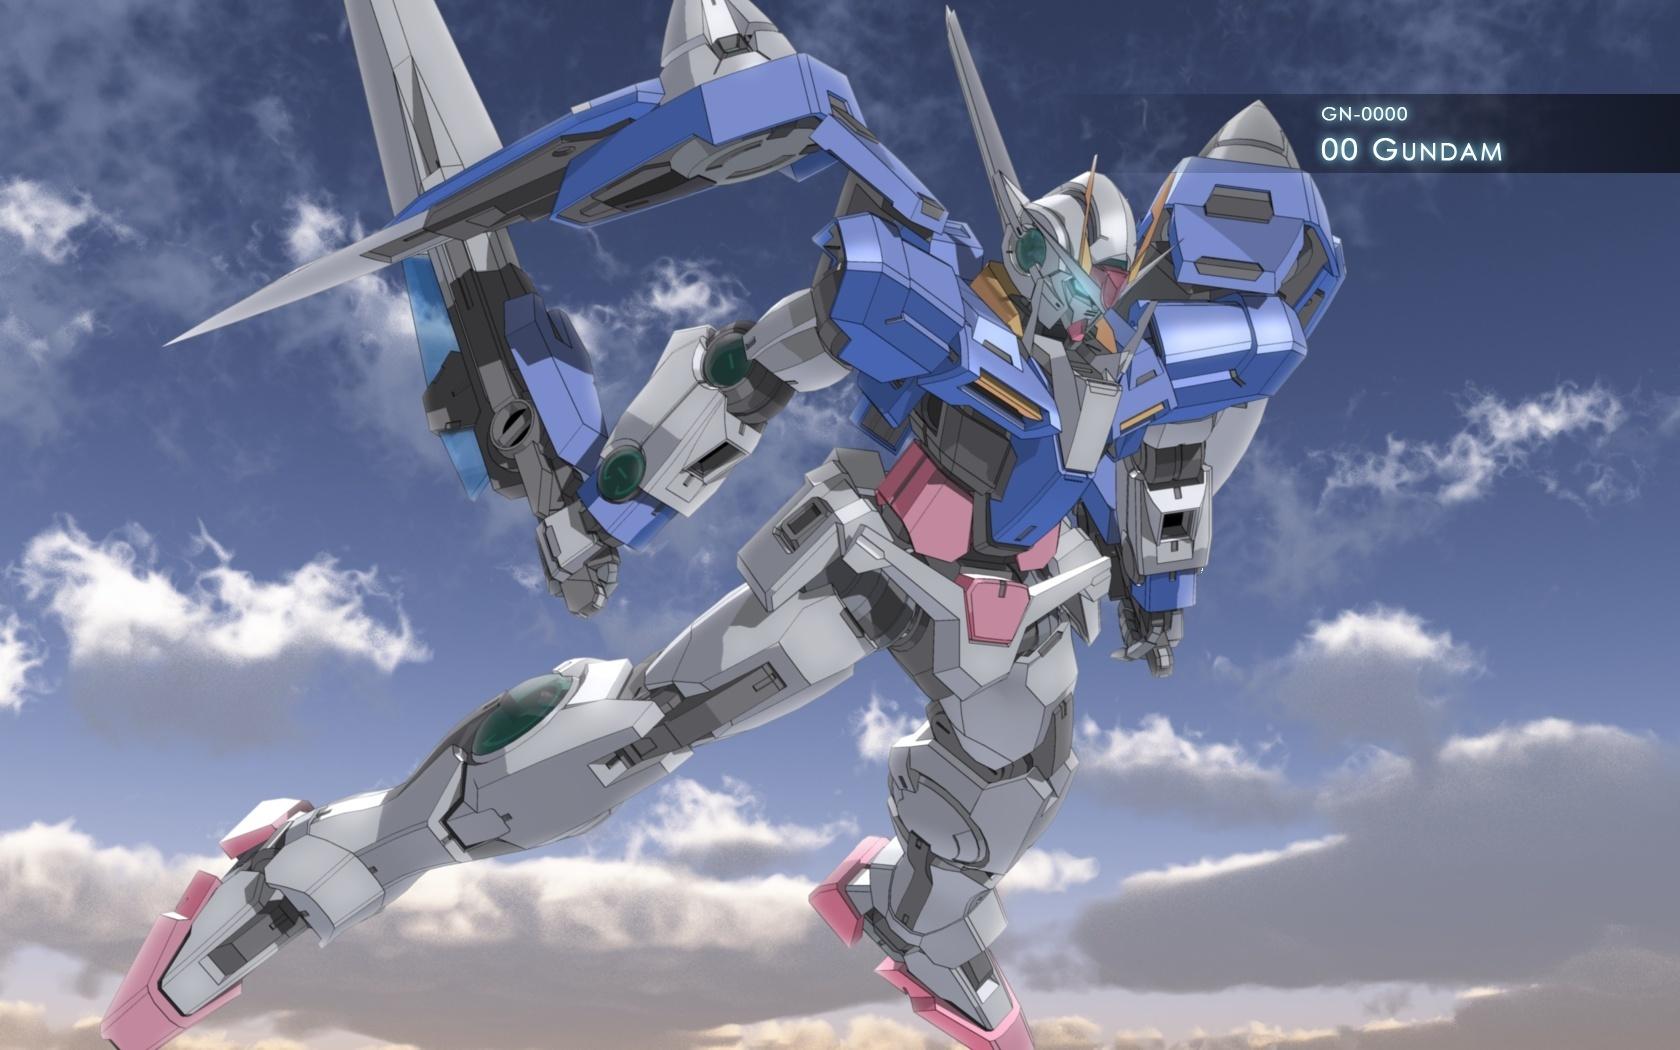 mobile suit gundam 00 images Gundam 00 HD wallpaper and 1680x1050